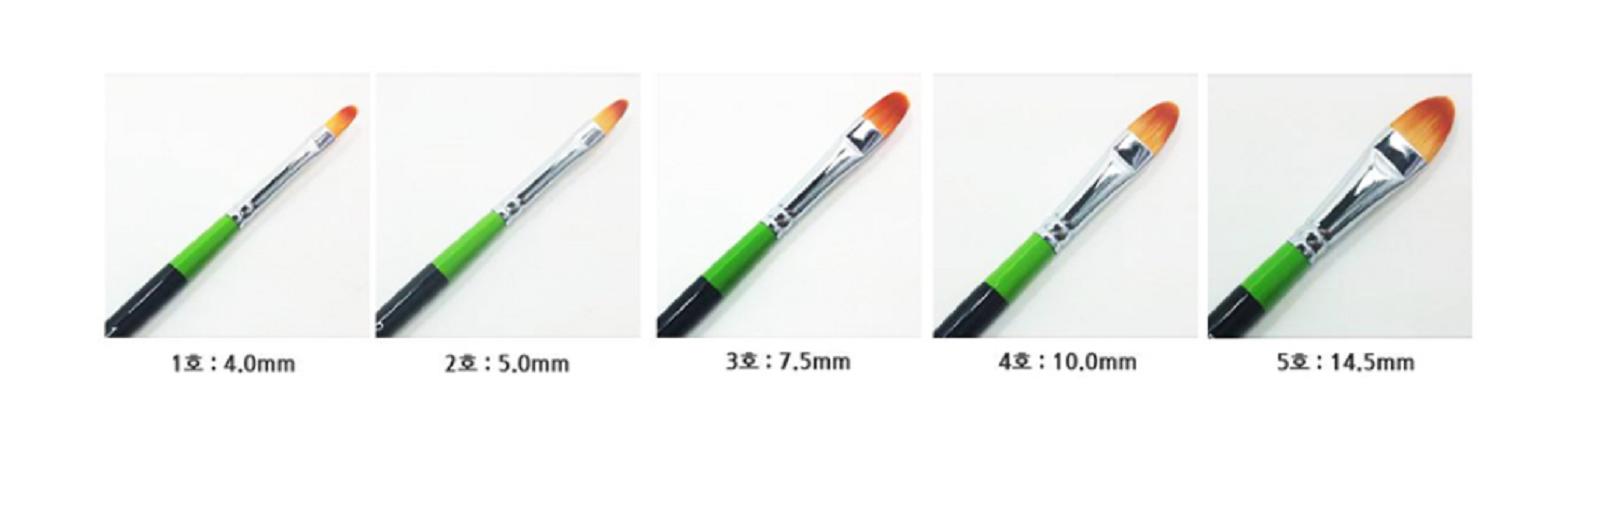 HWAHONG Artist Oil Acrylic Paint Brush Filbert Flat Brush 815 1Set 7ea Brushes